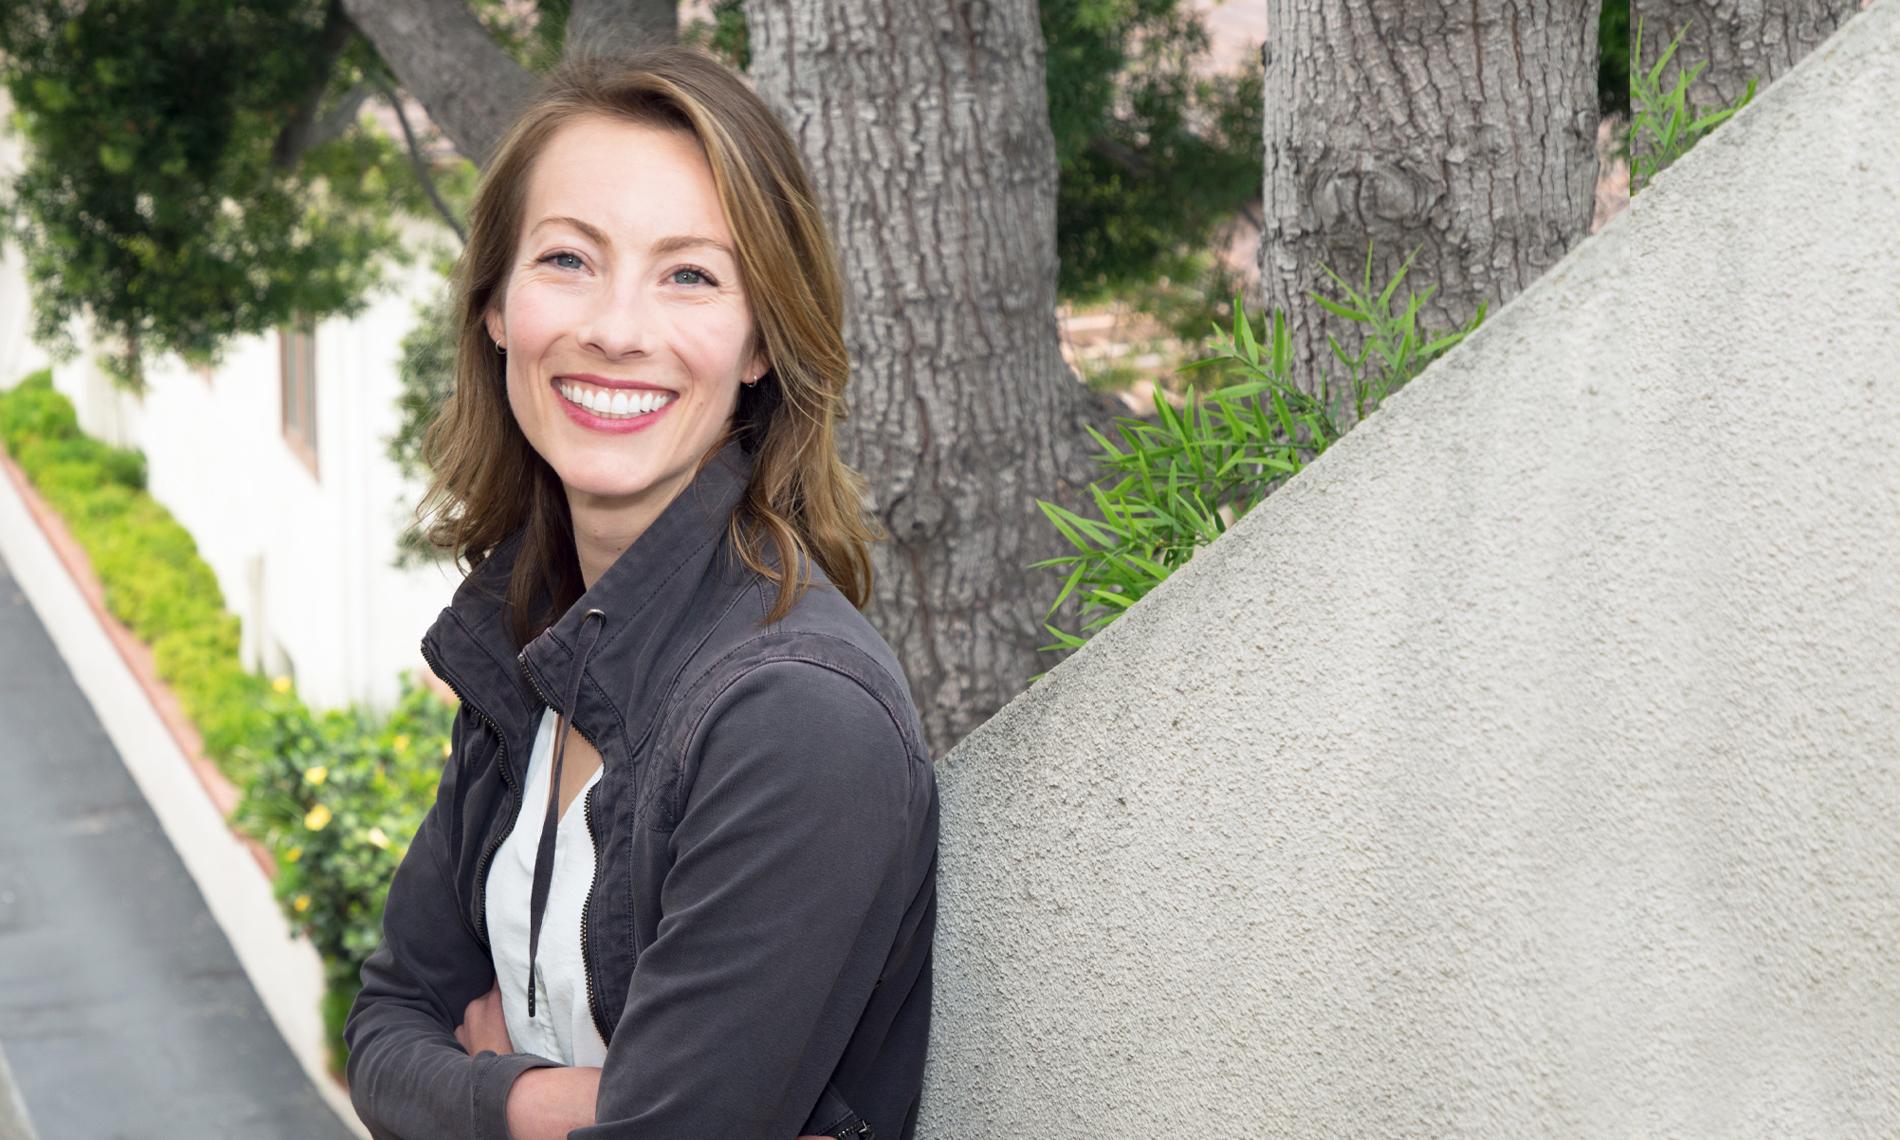 Clinical Psychology alum Emily Eccles